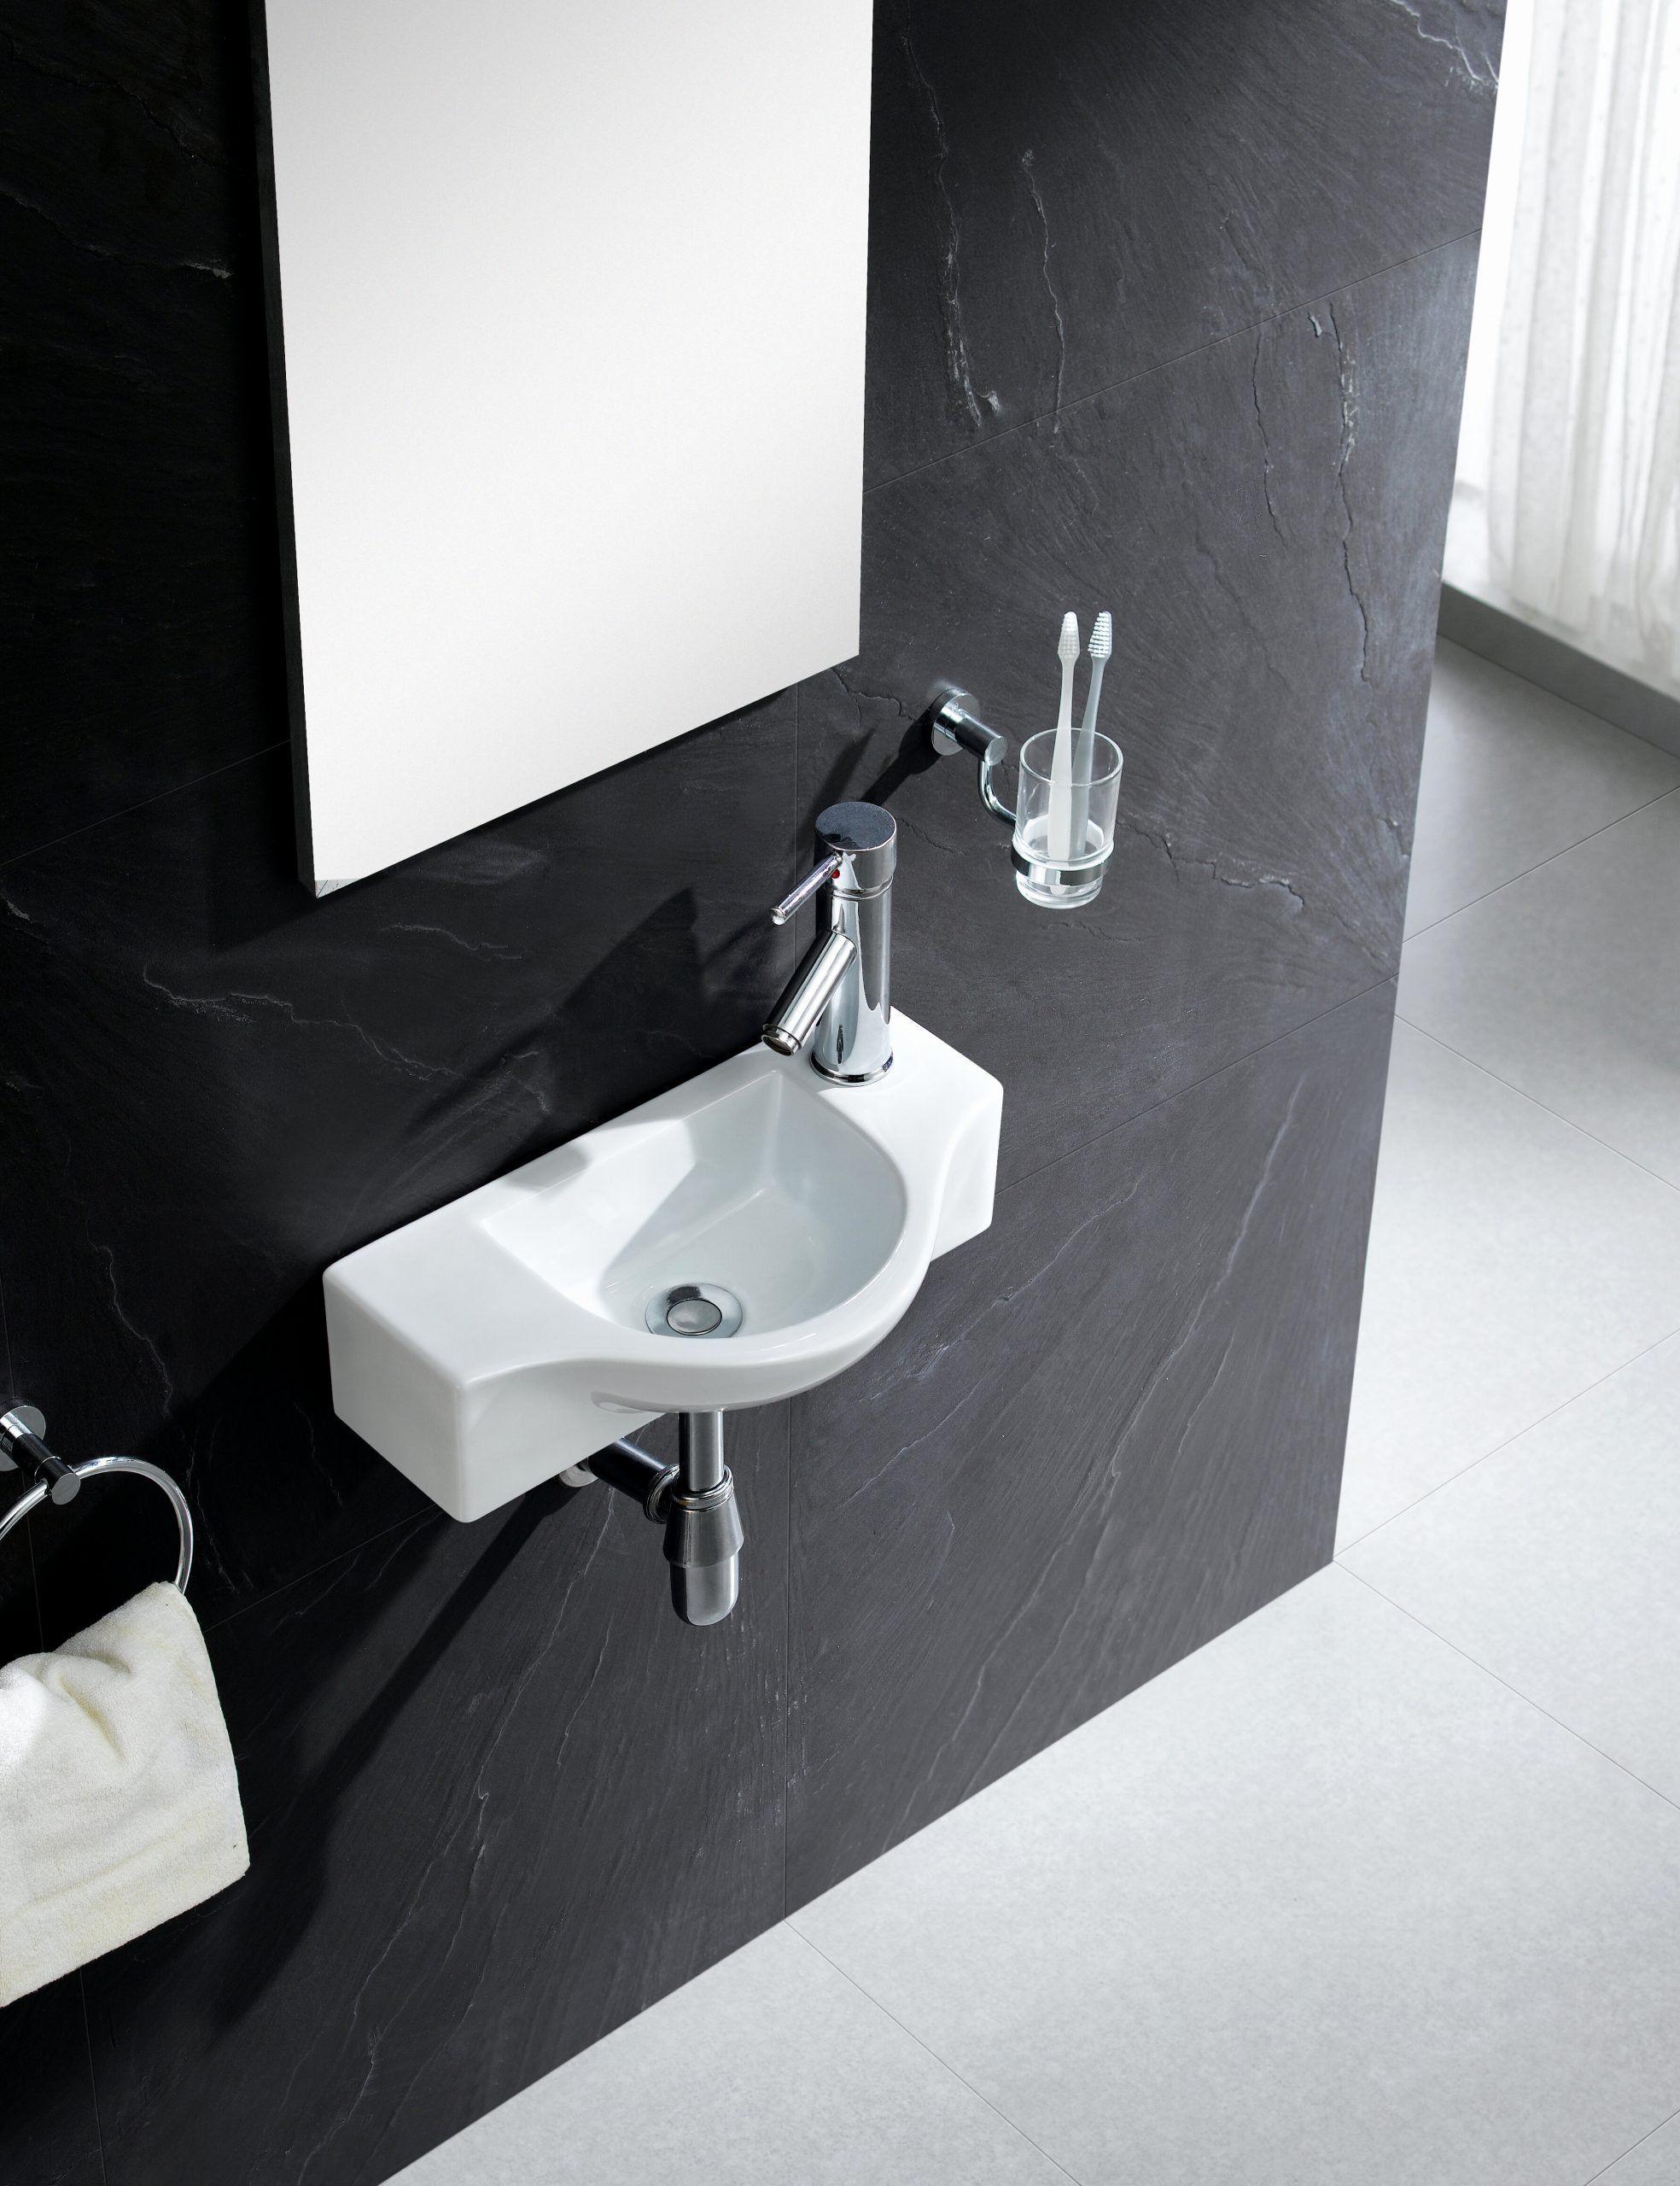 Sink For Small Bathroom Elegant Fine Fixtures Modern Ceramic 18 Wall Mount Bathroom Sink In 2020 Wall Mounted Bathroom Sinks Bathroom Sink Sink